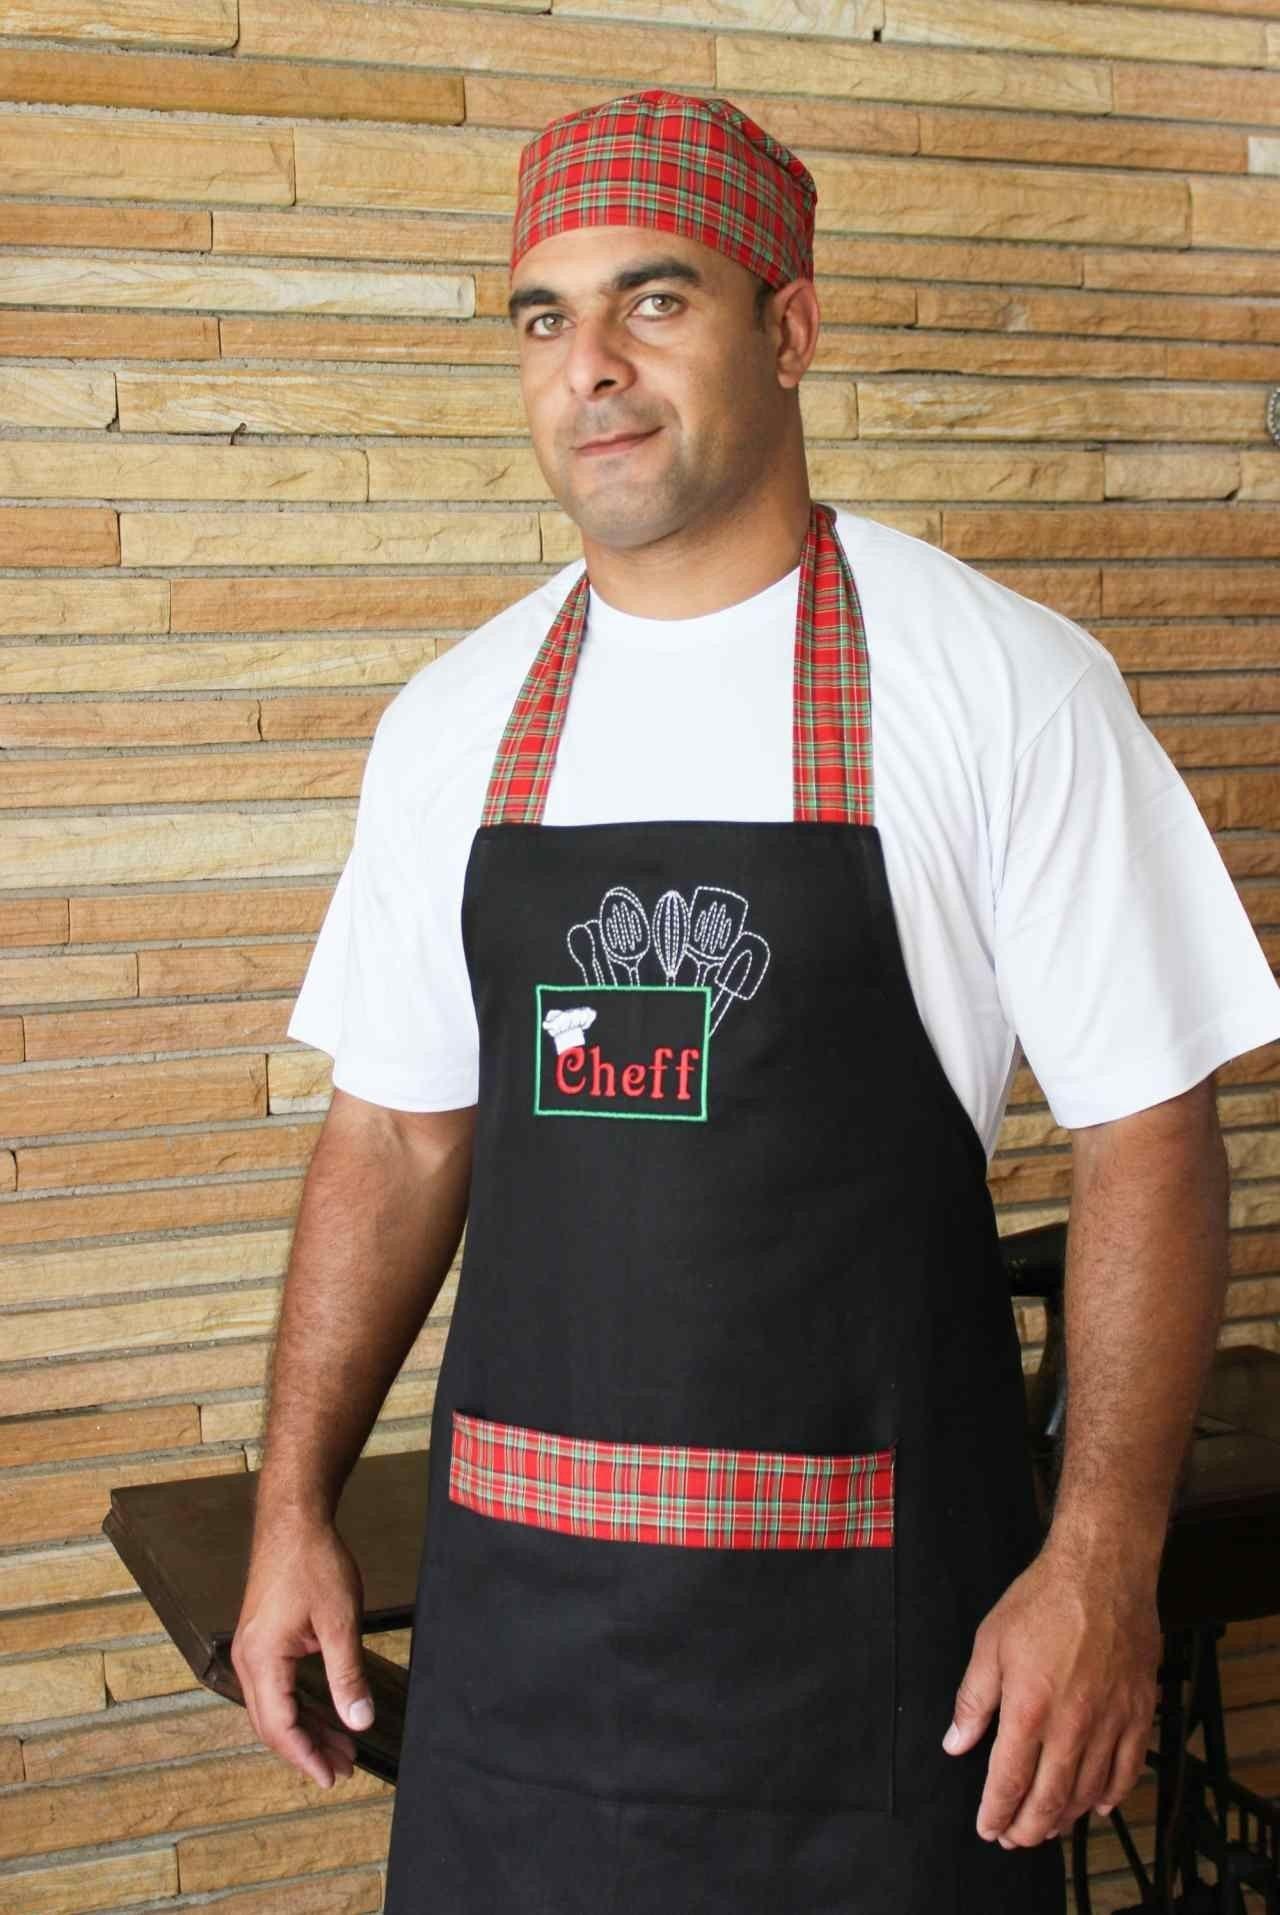 картинка мужчина в фартуке кухня